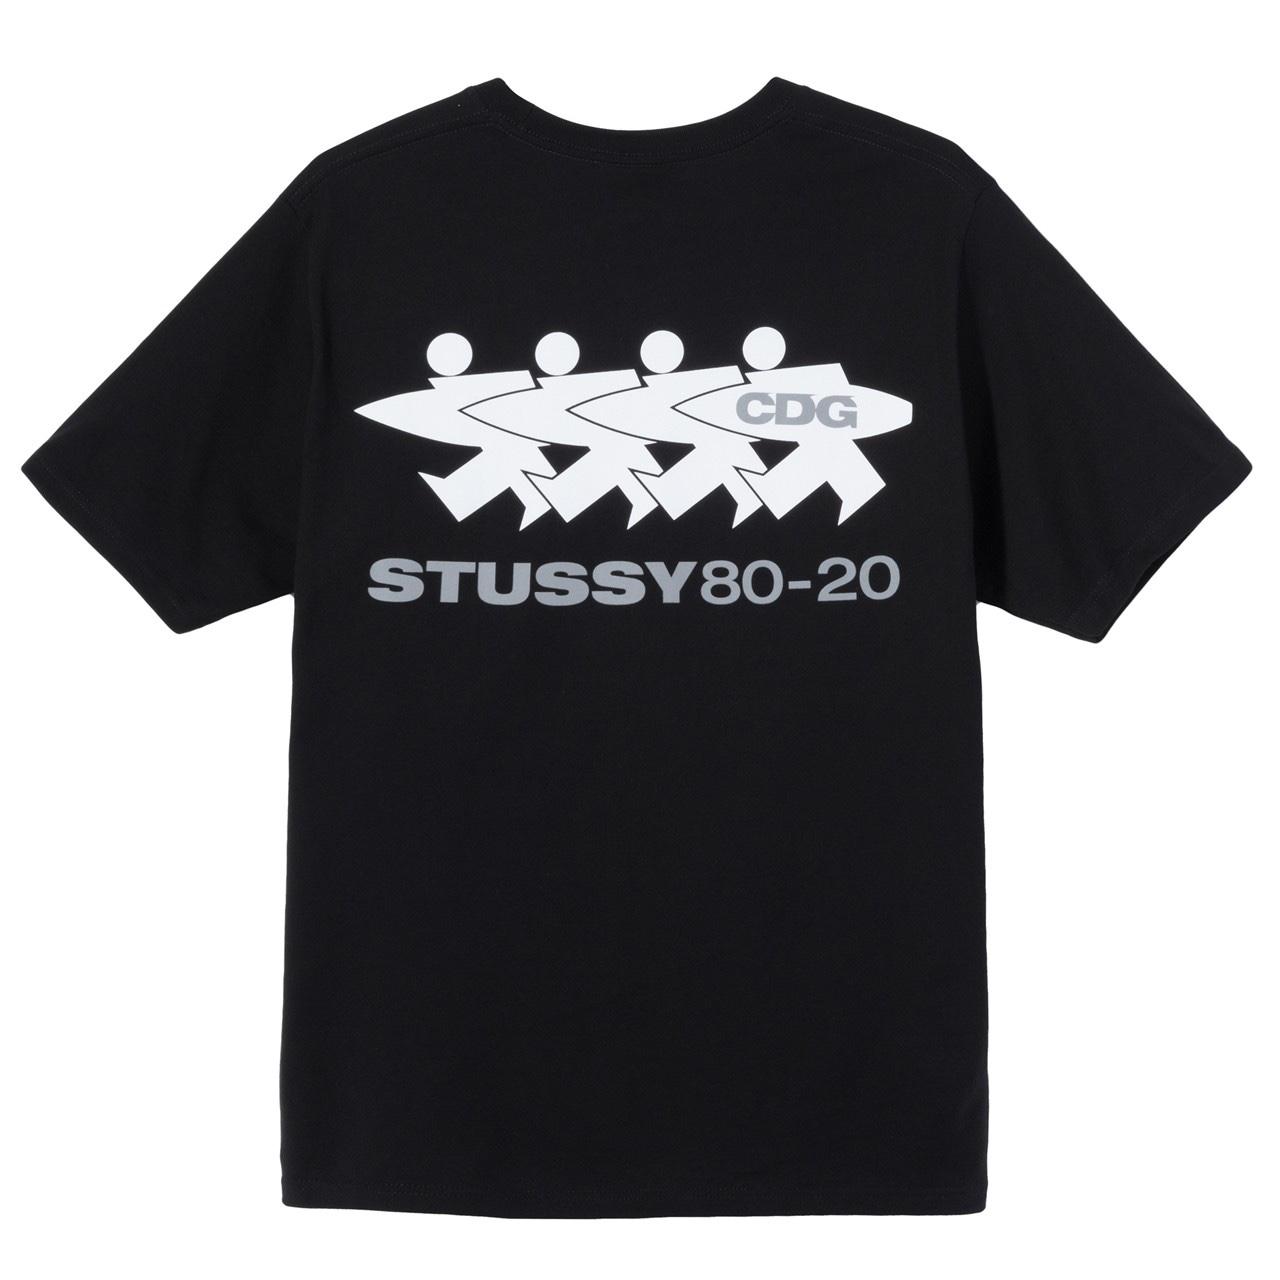 Stussy x CDG tee